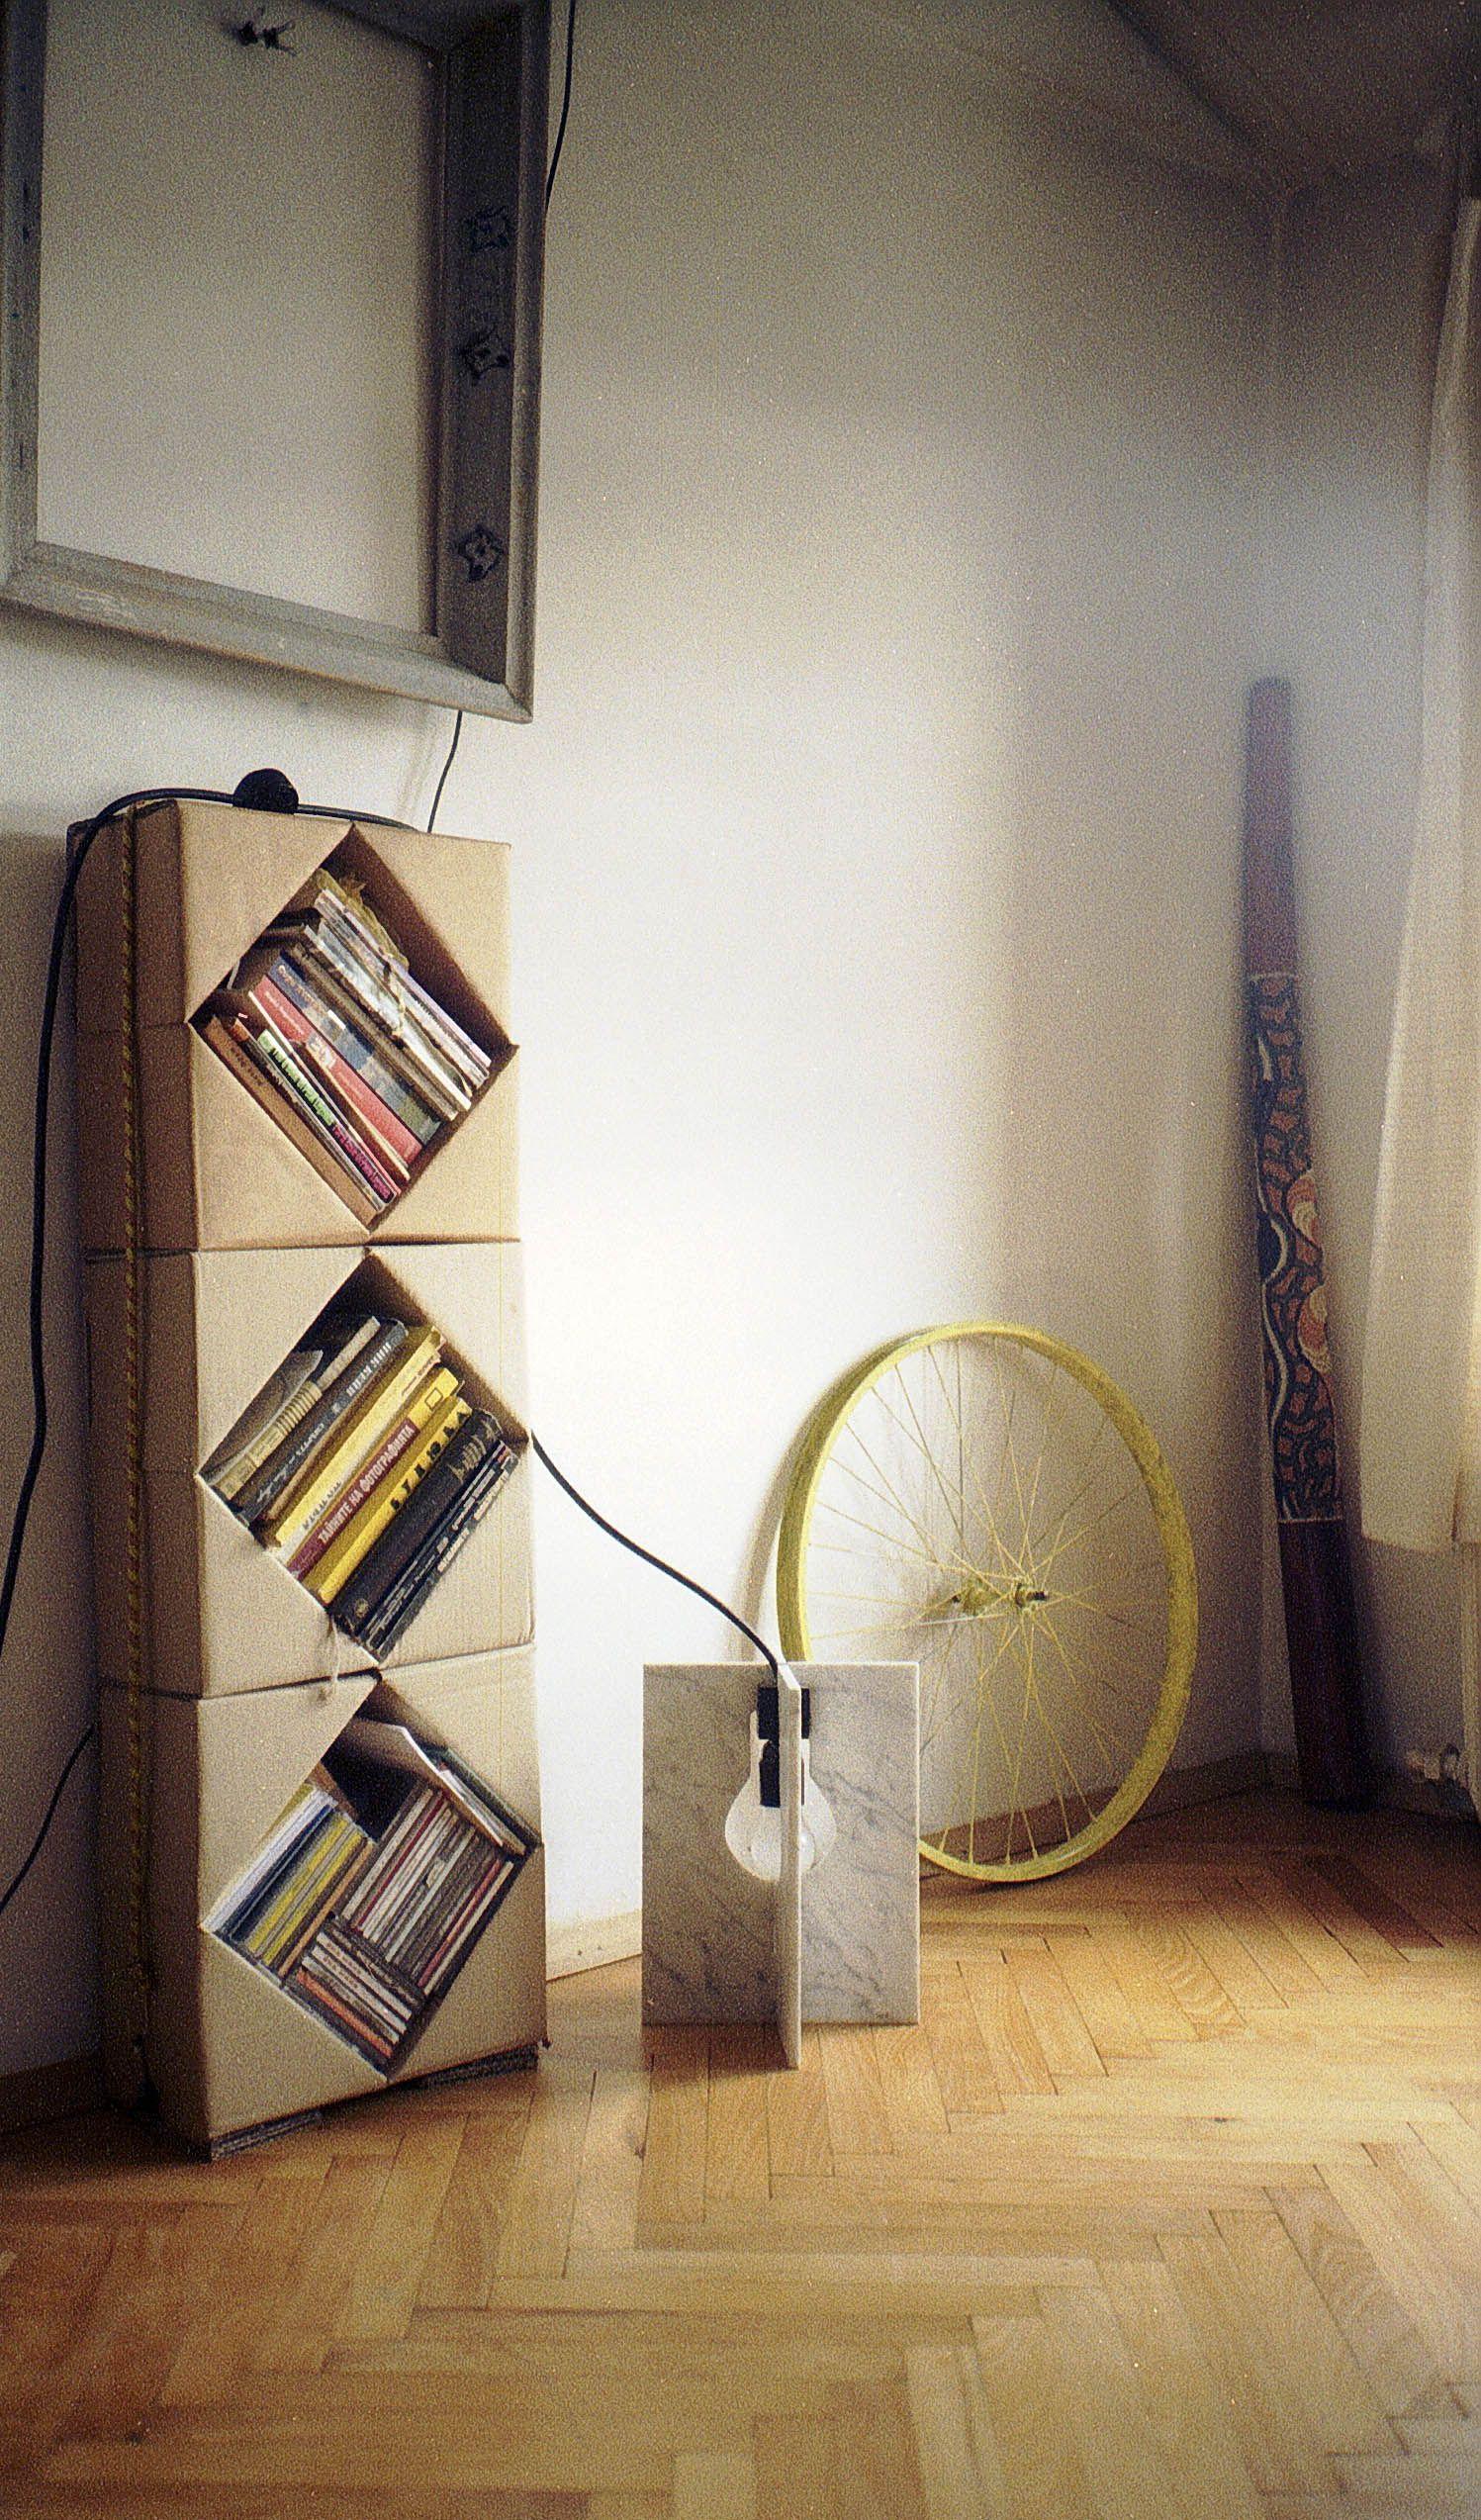 Cardboard Shelf Rrrubcom My Works Cardboard Furniture - Cardboard-bookshelves